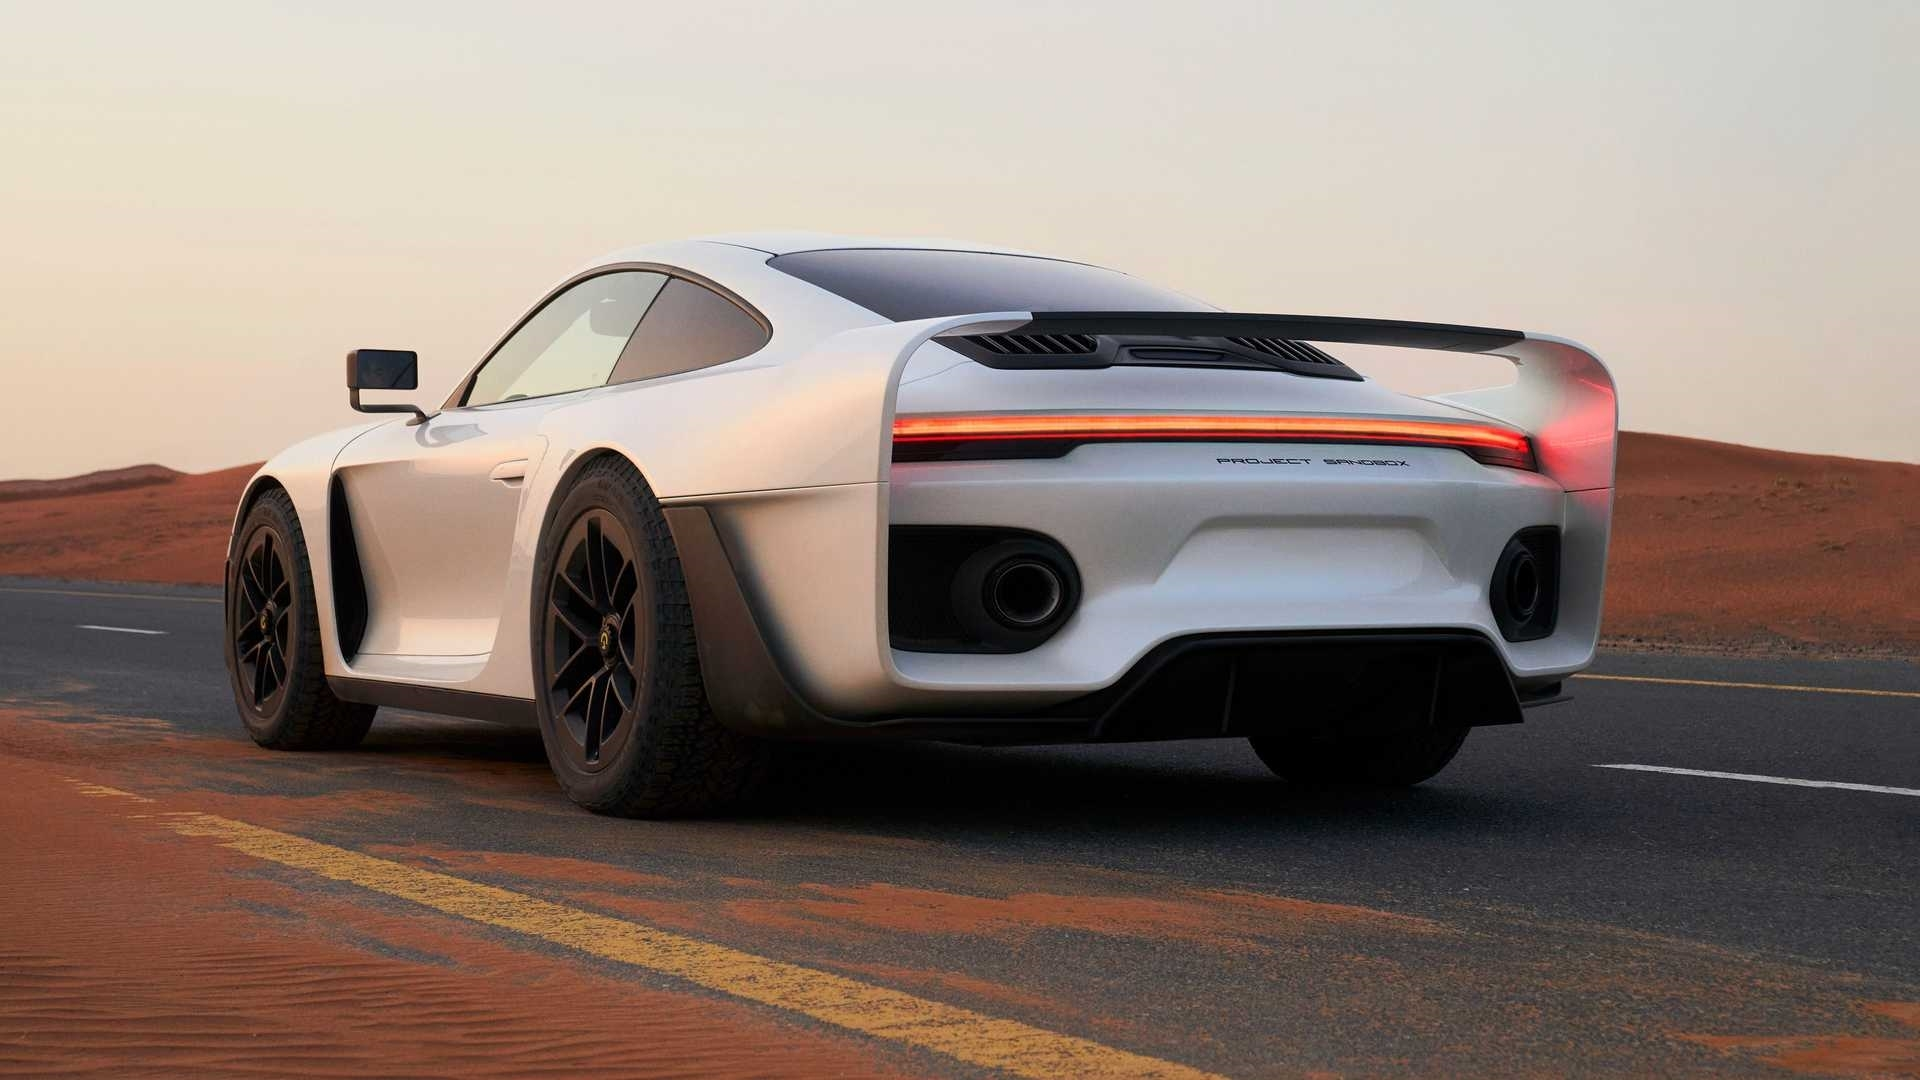 Gemballa Marsien Porsche 911 Safari 0721 002